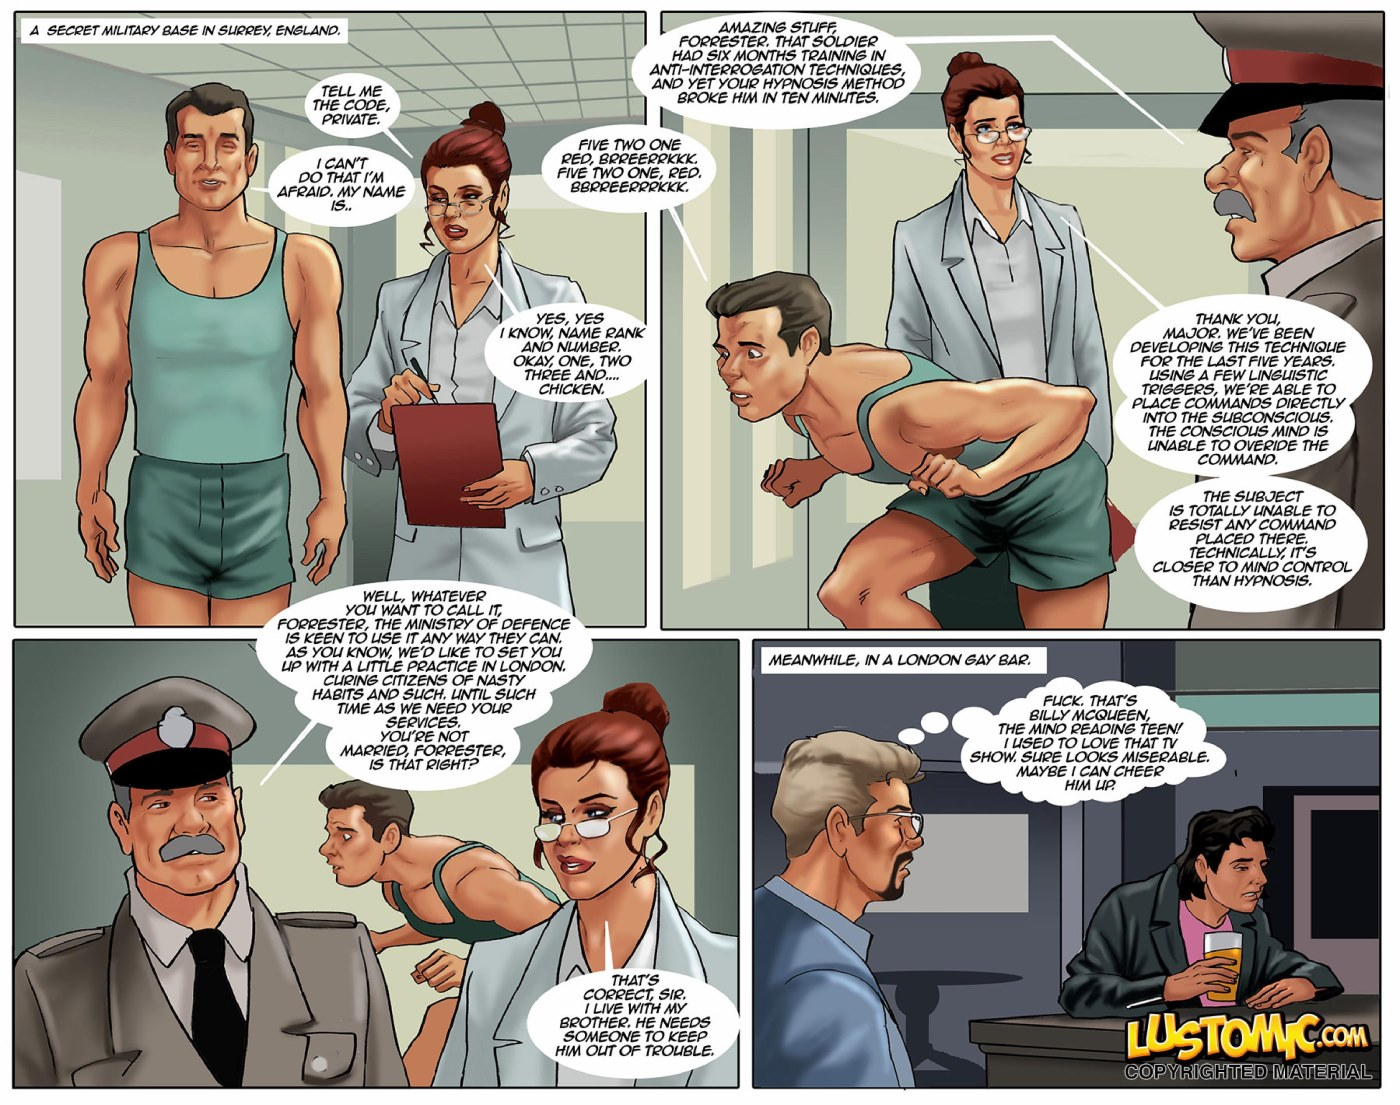 Hypno Slut (Stonehouse)- Lustomic porn comics 8 muses